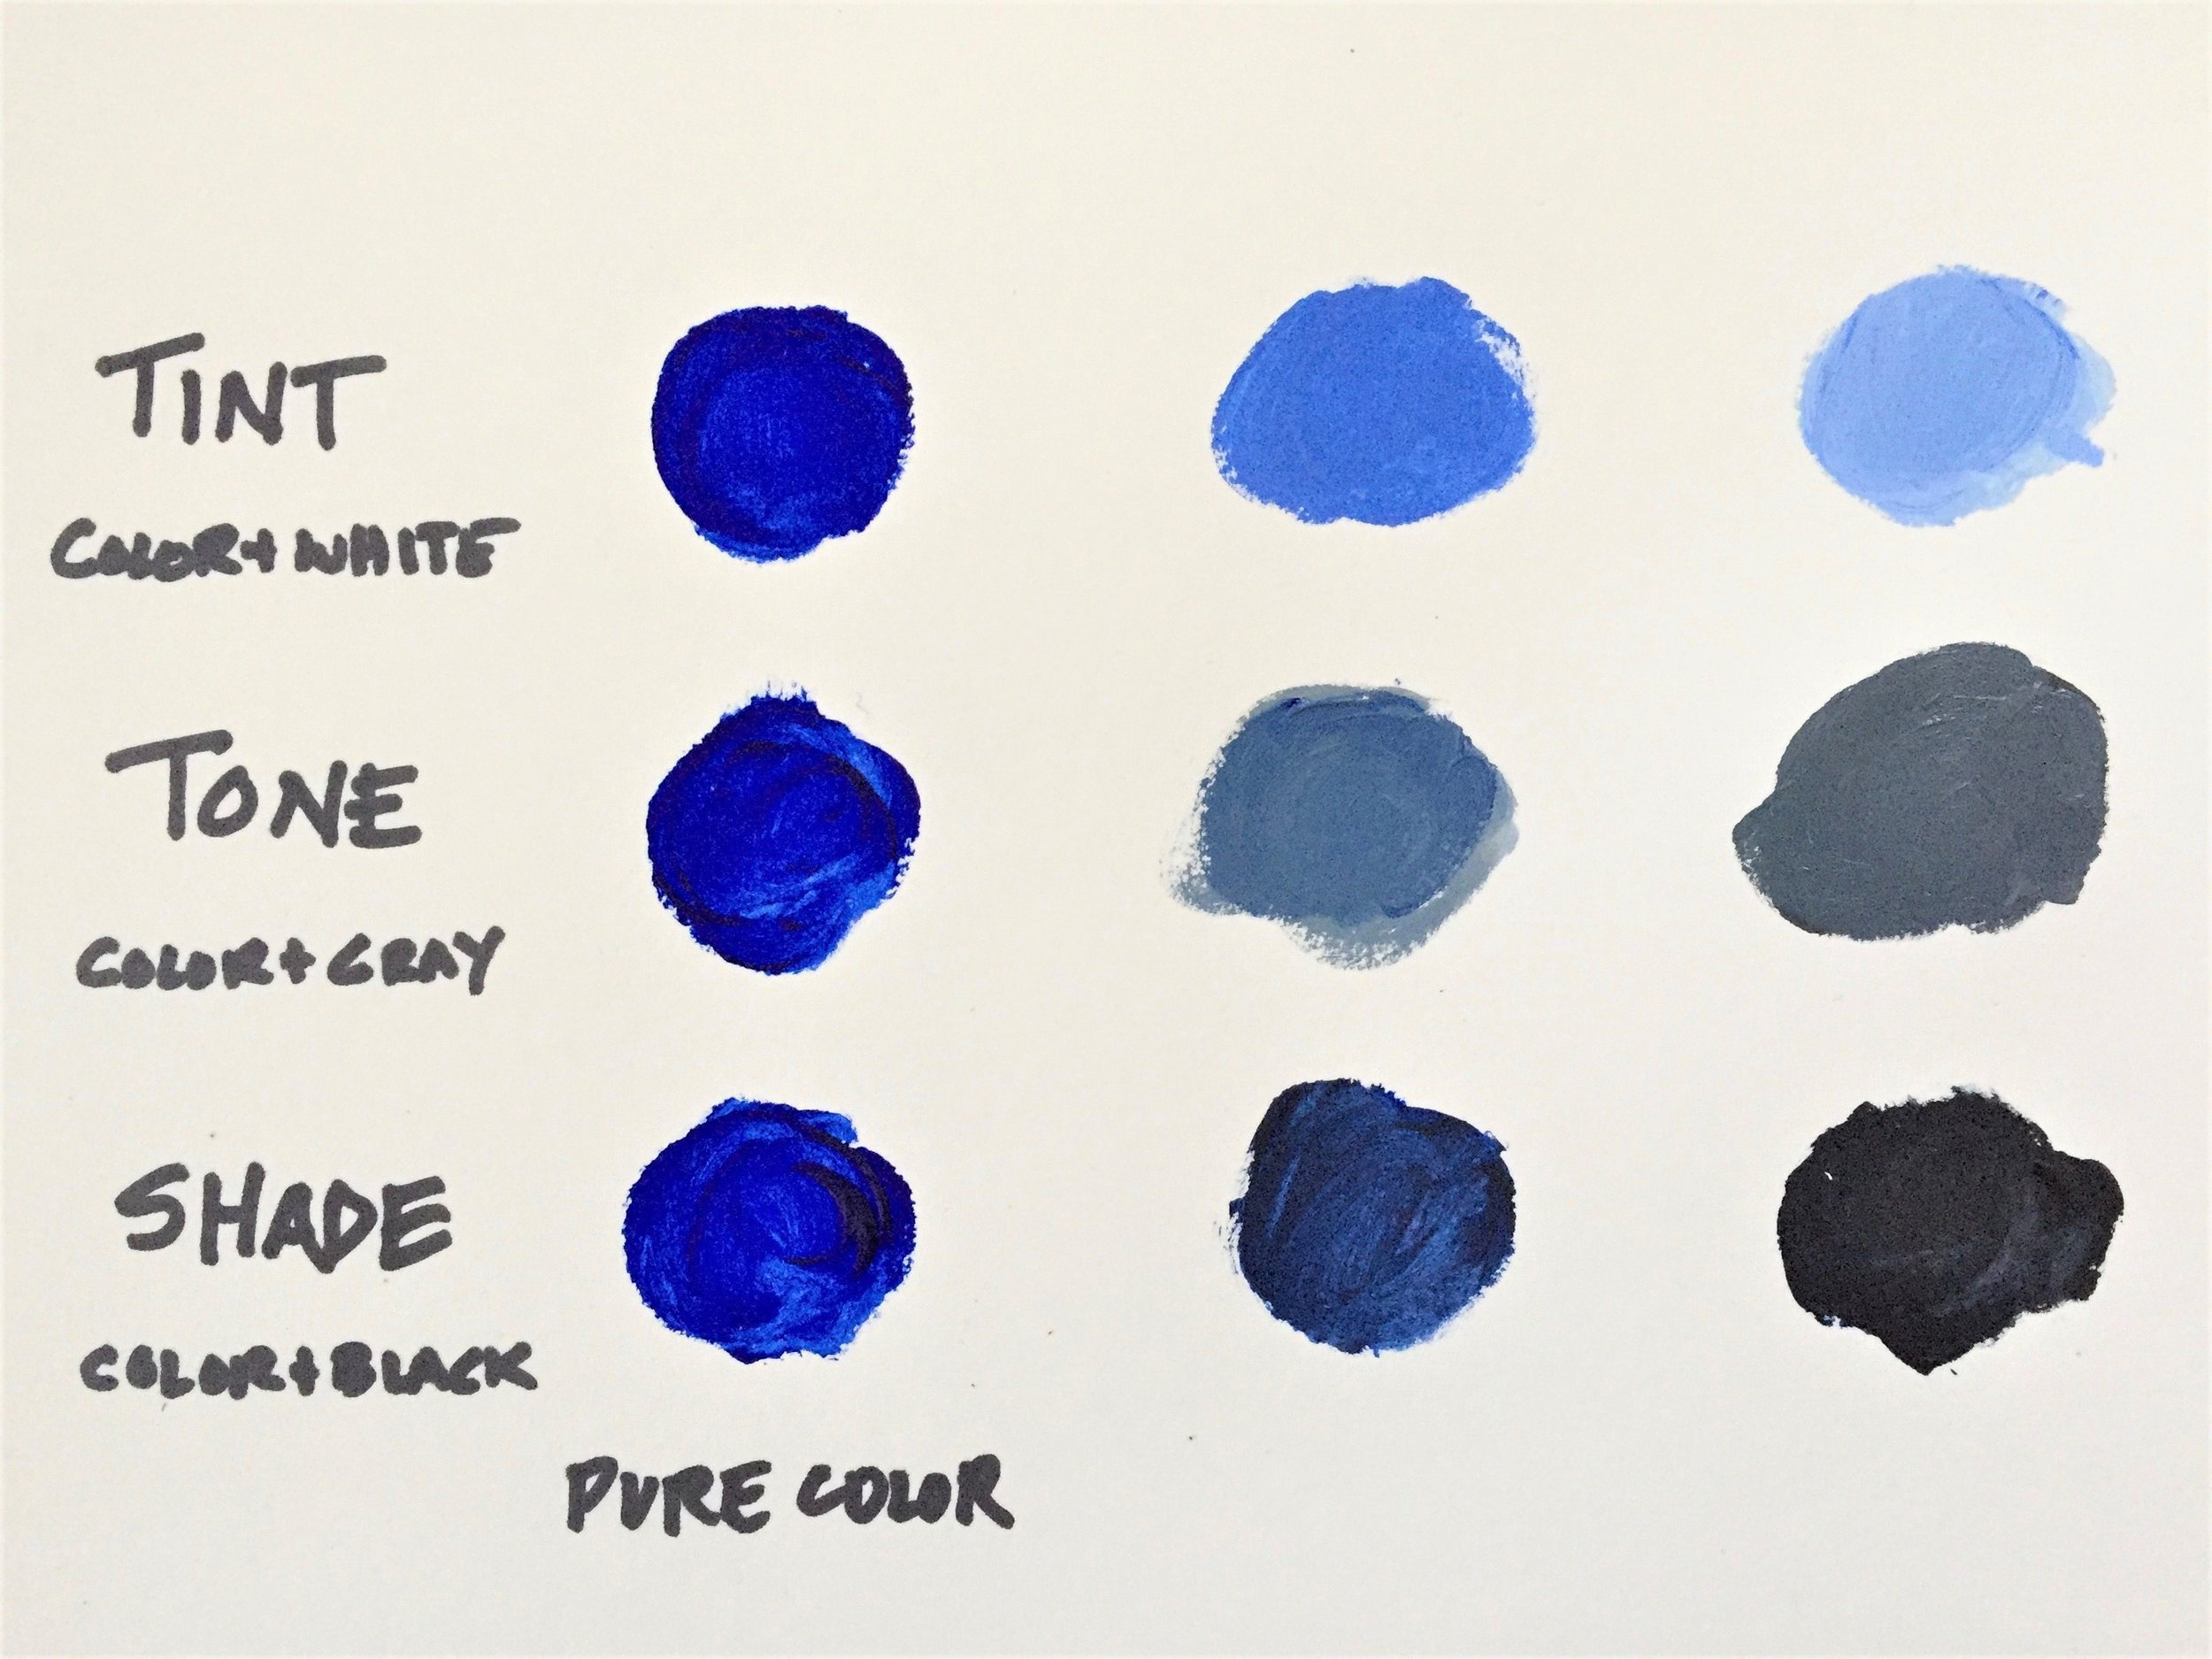 1 Values of blue 1.jpg